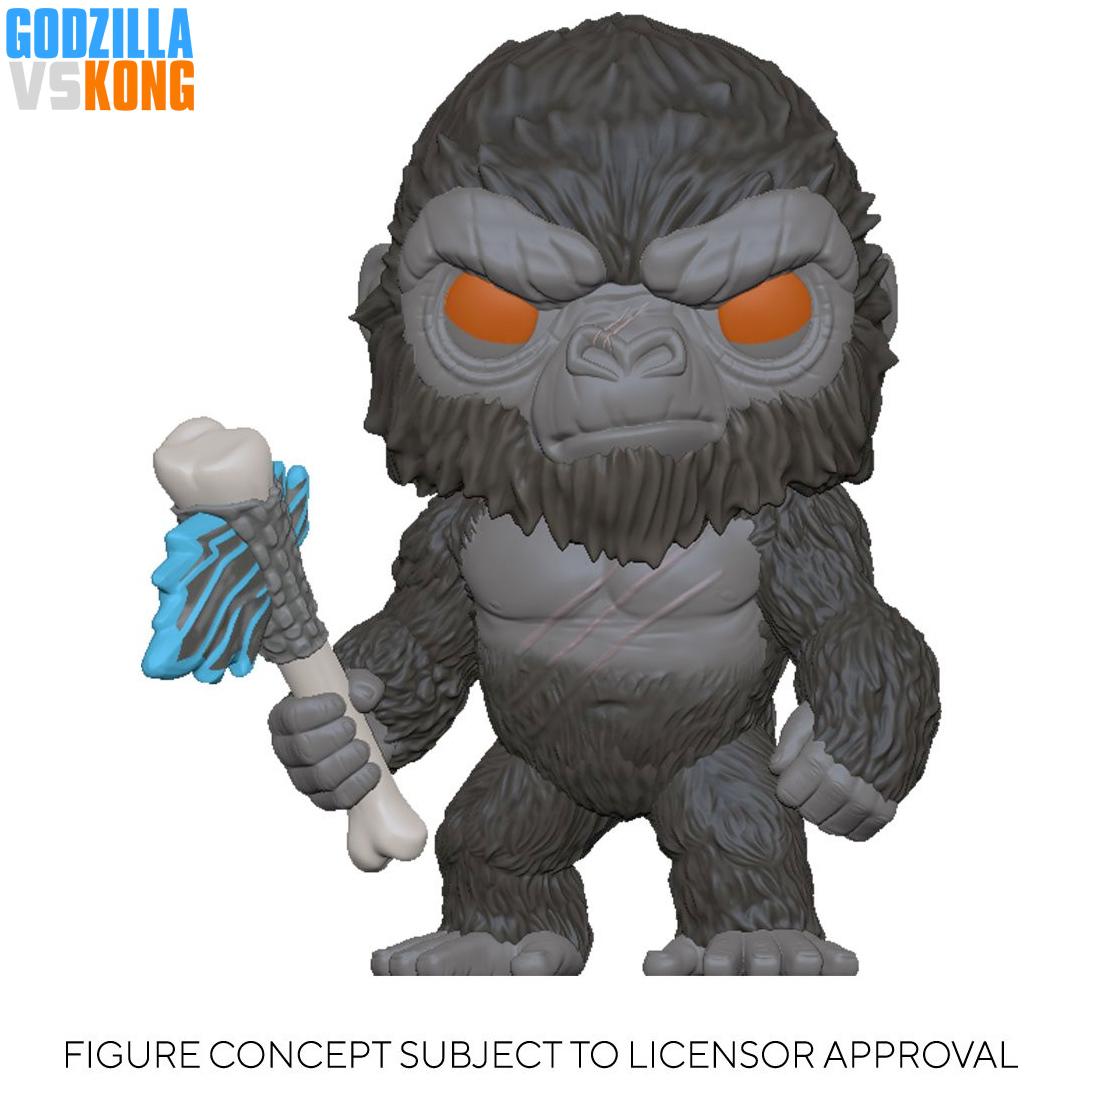 Bonecos Godzilla vs Kong Pop 2021 Funko